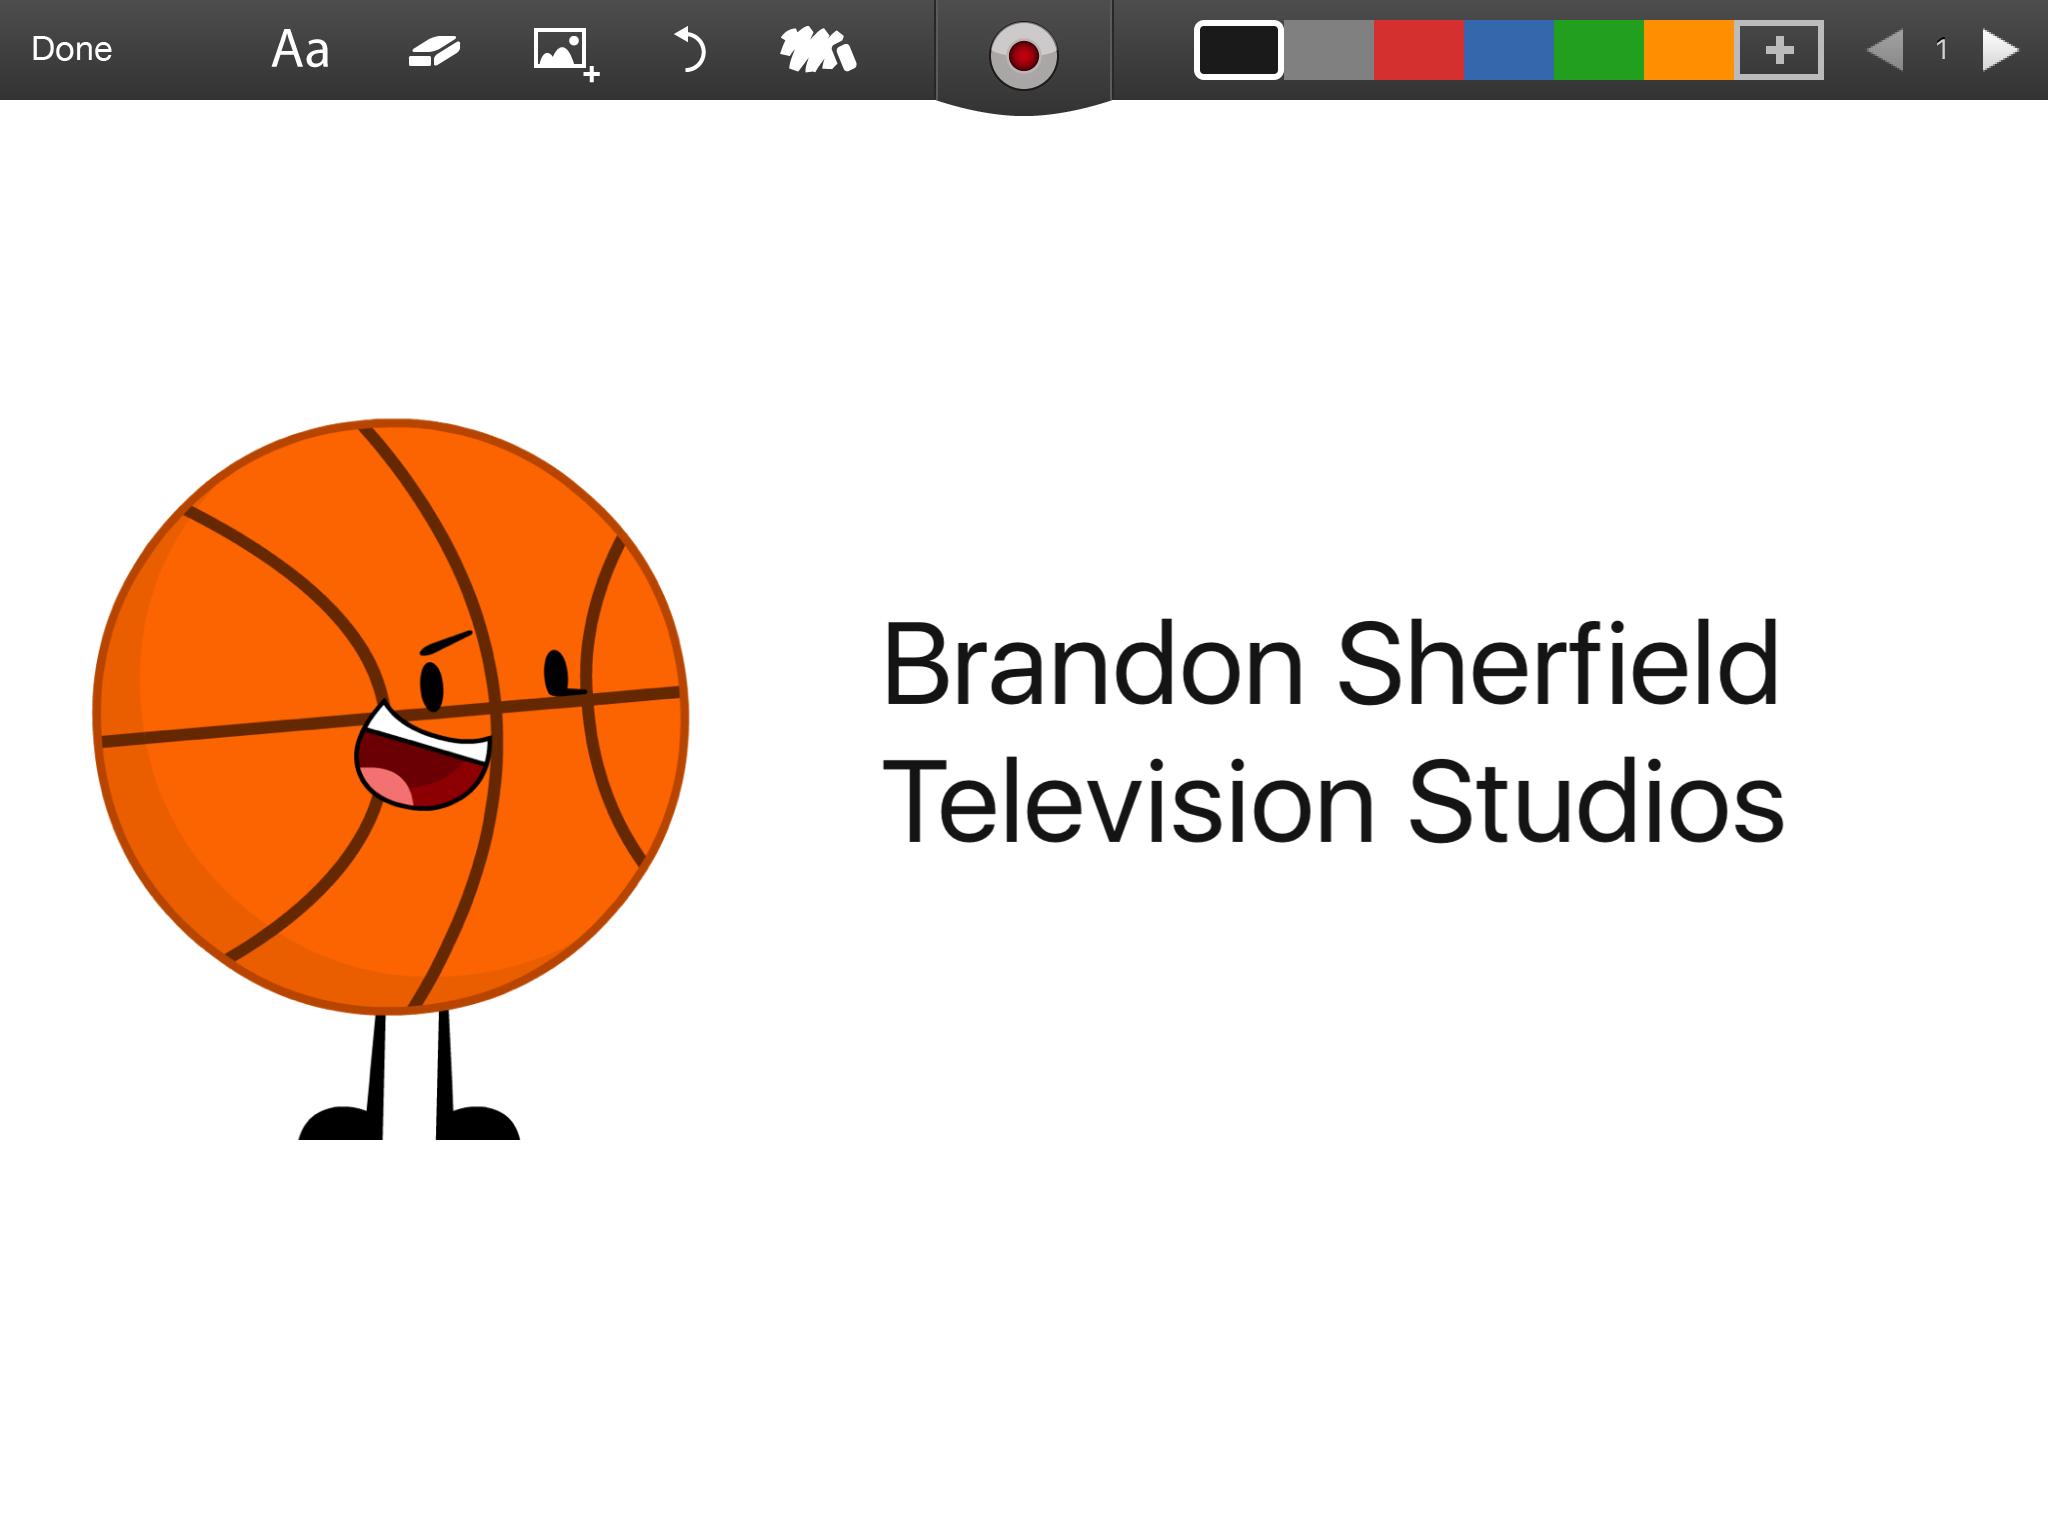 Brandon Sherfield Televison Studios